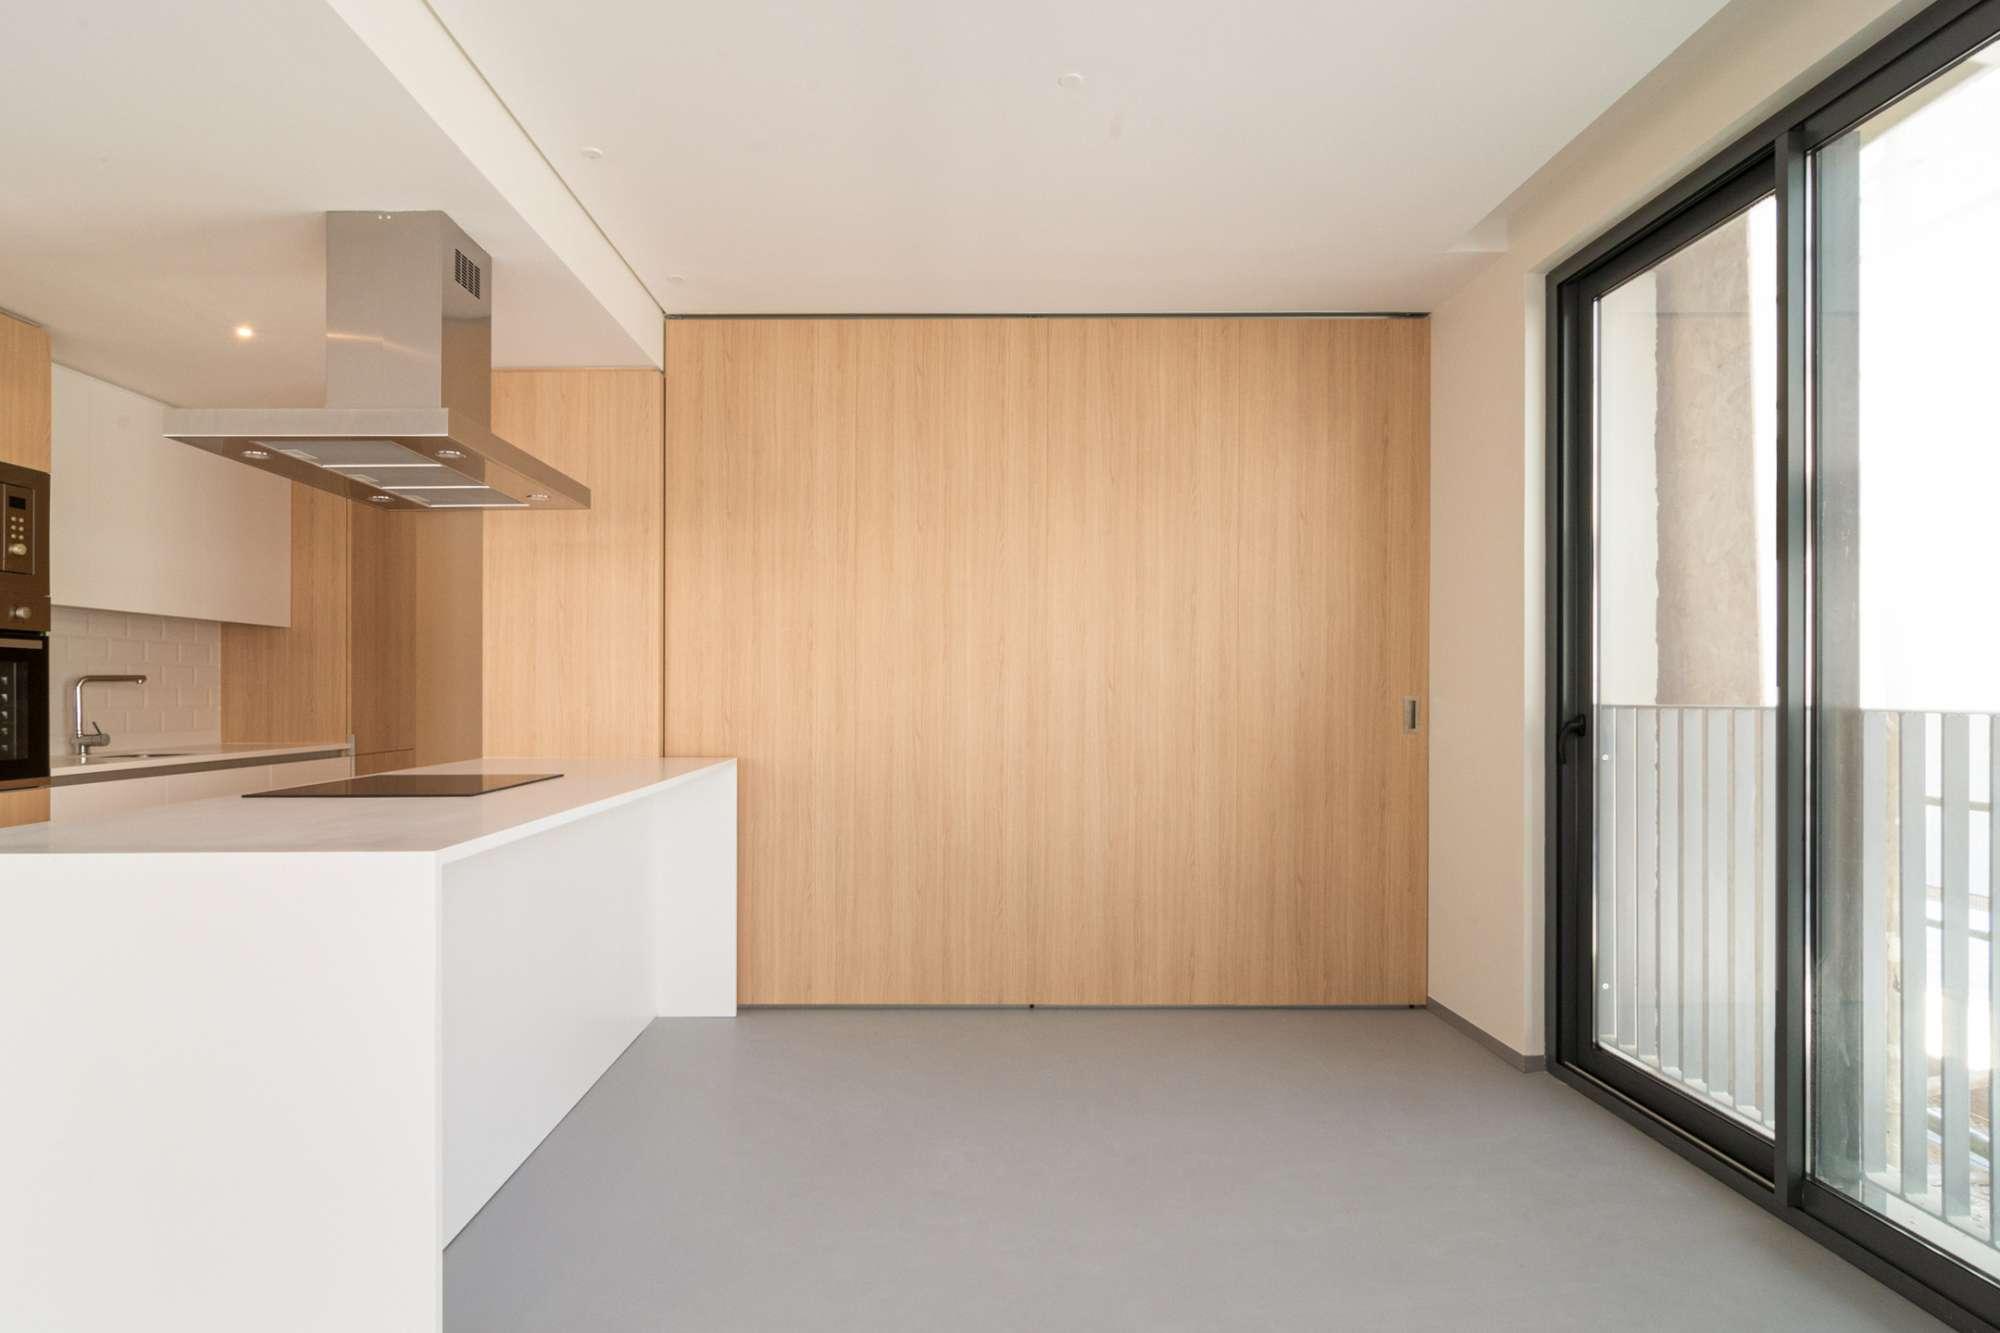 PF21544, Apartamento T2, Lisboa